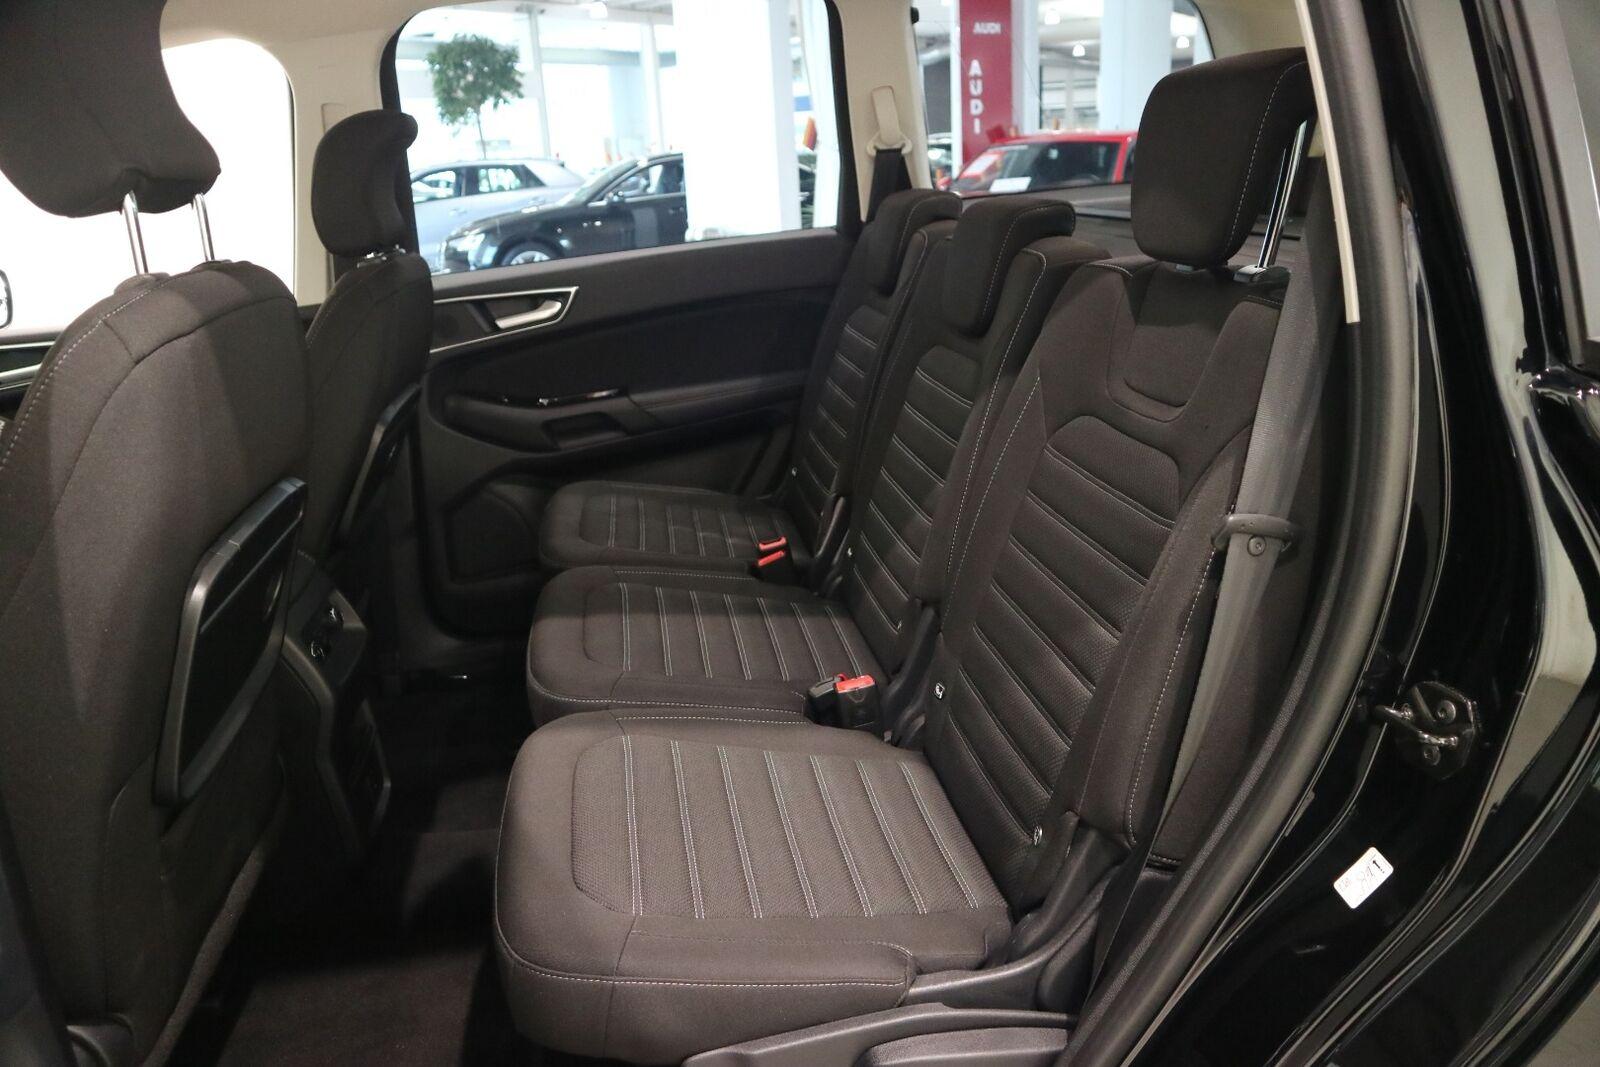 Ford Galaxy 2,0 TDCi 180 Titanium aut. - billede 14